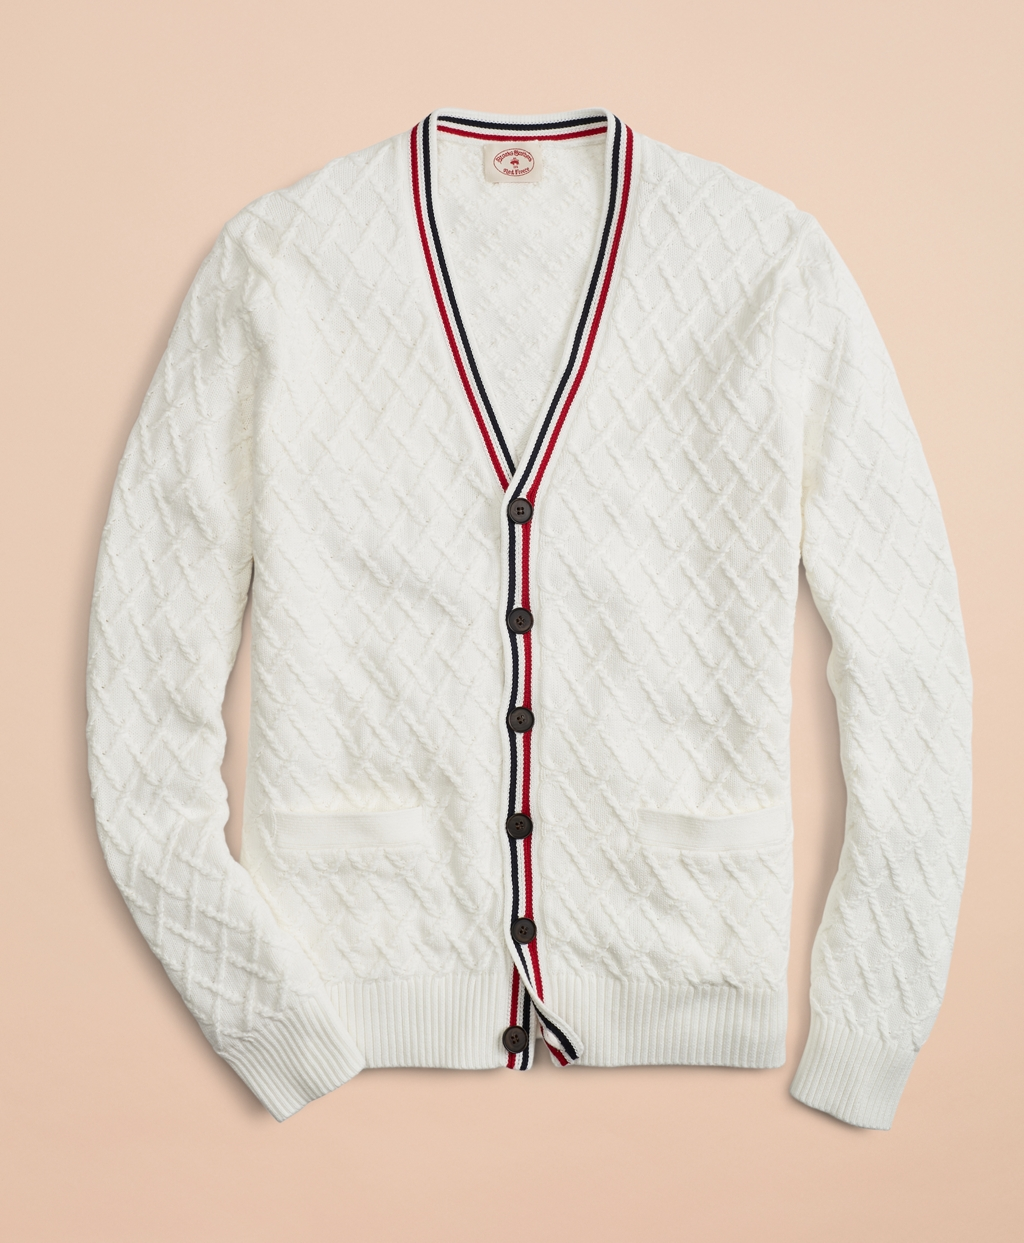 Men's Vintage Sweaters – 1920s to 1960s Retro Jumpers Brooks Brothers Mens Cotton V-Neck Tennis Cardigan $73.87 AT vintagedancer.com